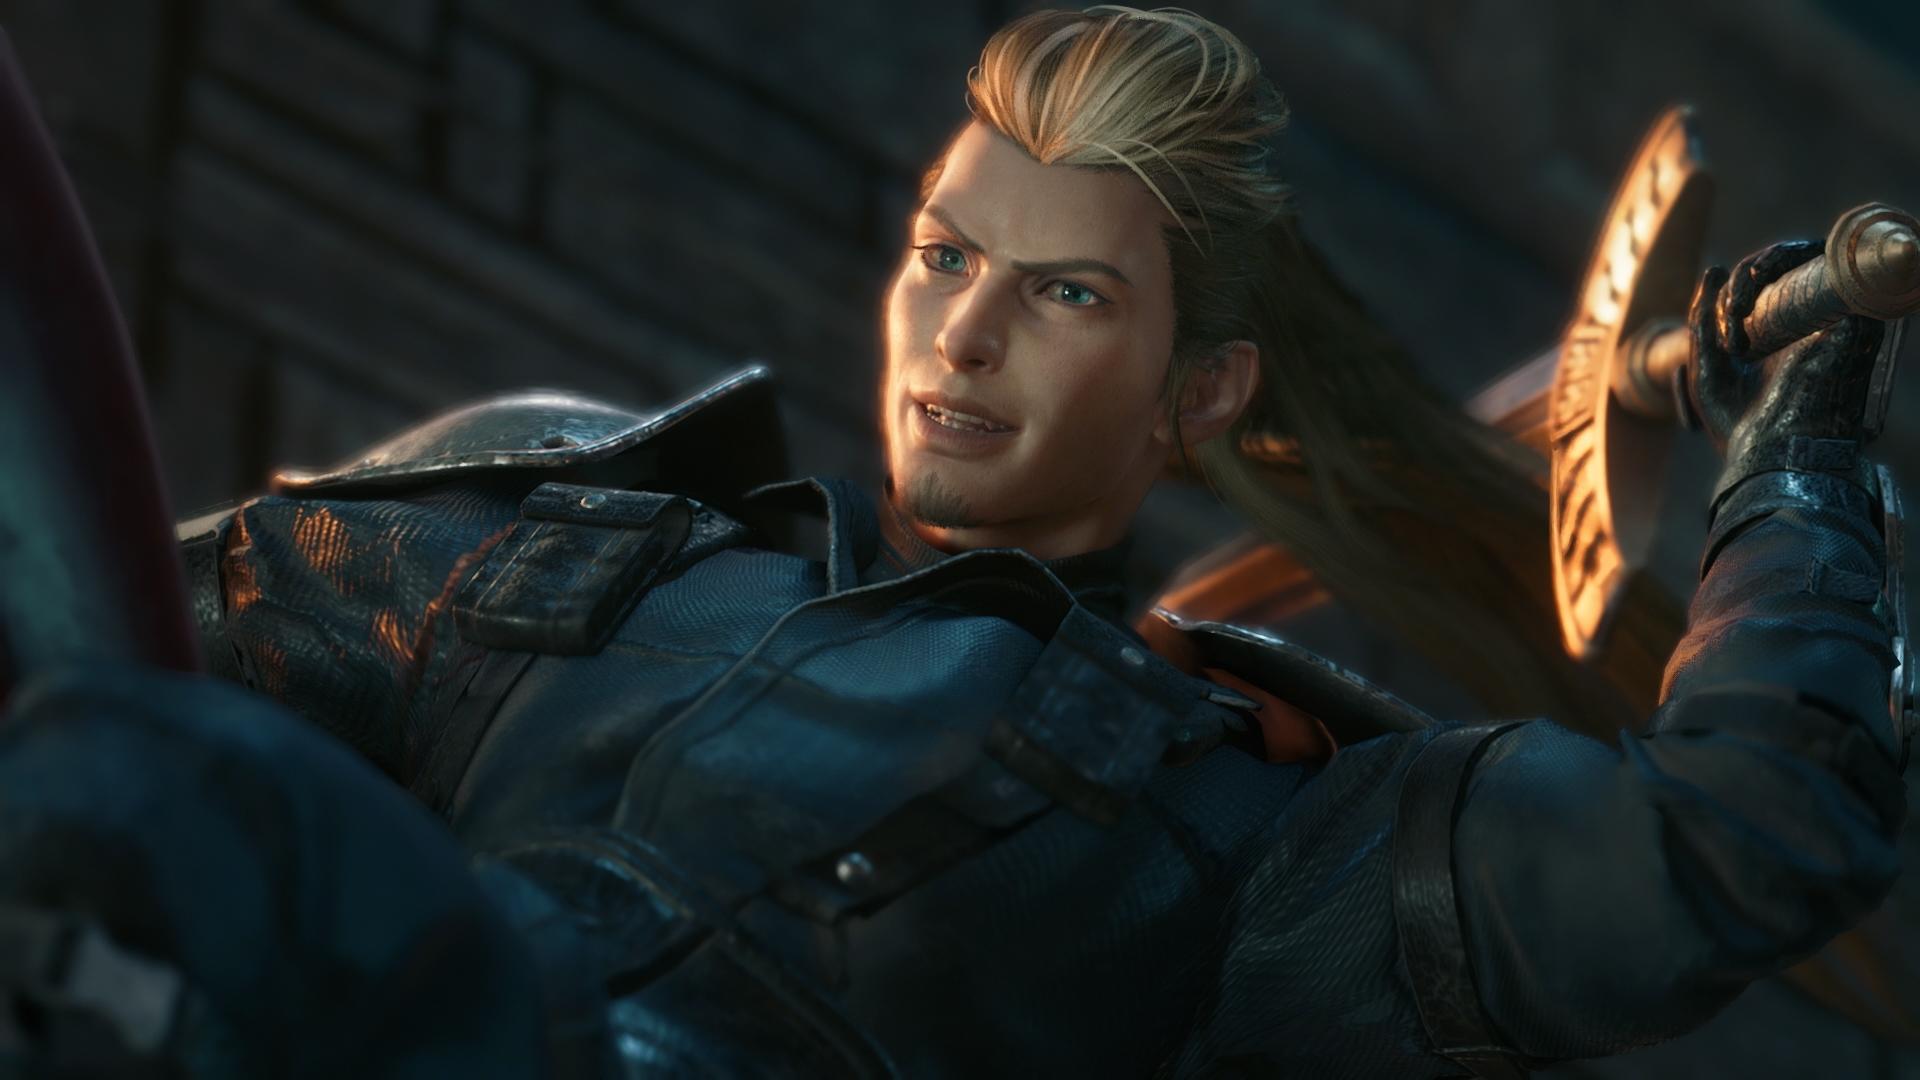 New Final Fantasy 7 Remake screens show iconic scenes